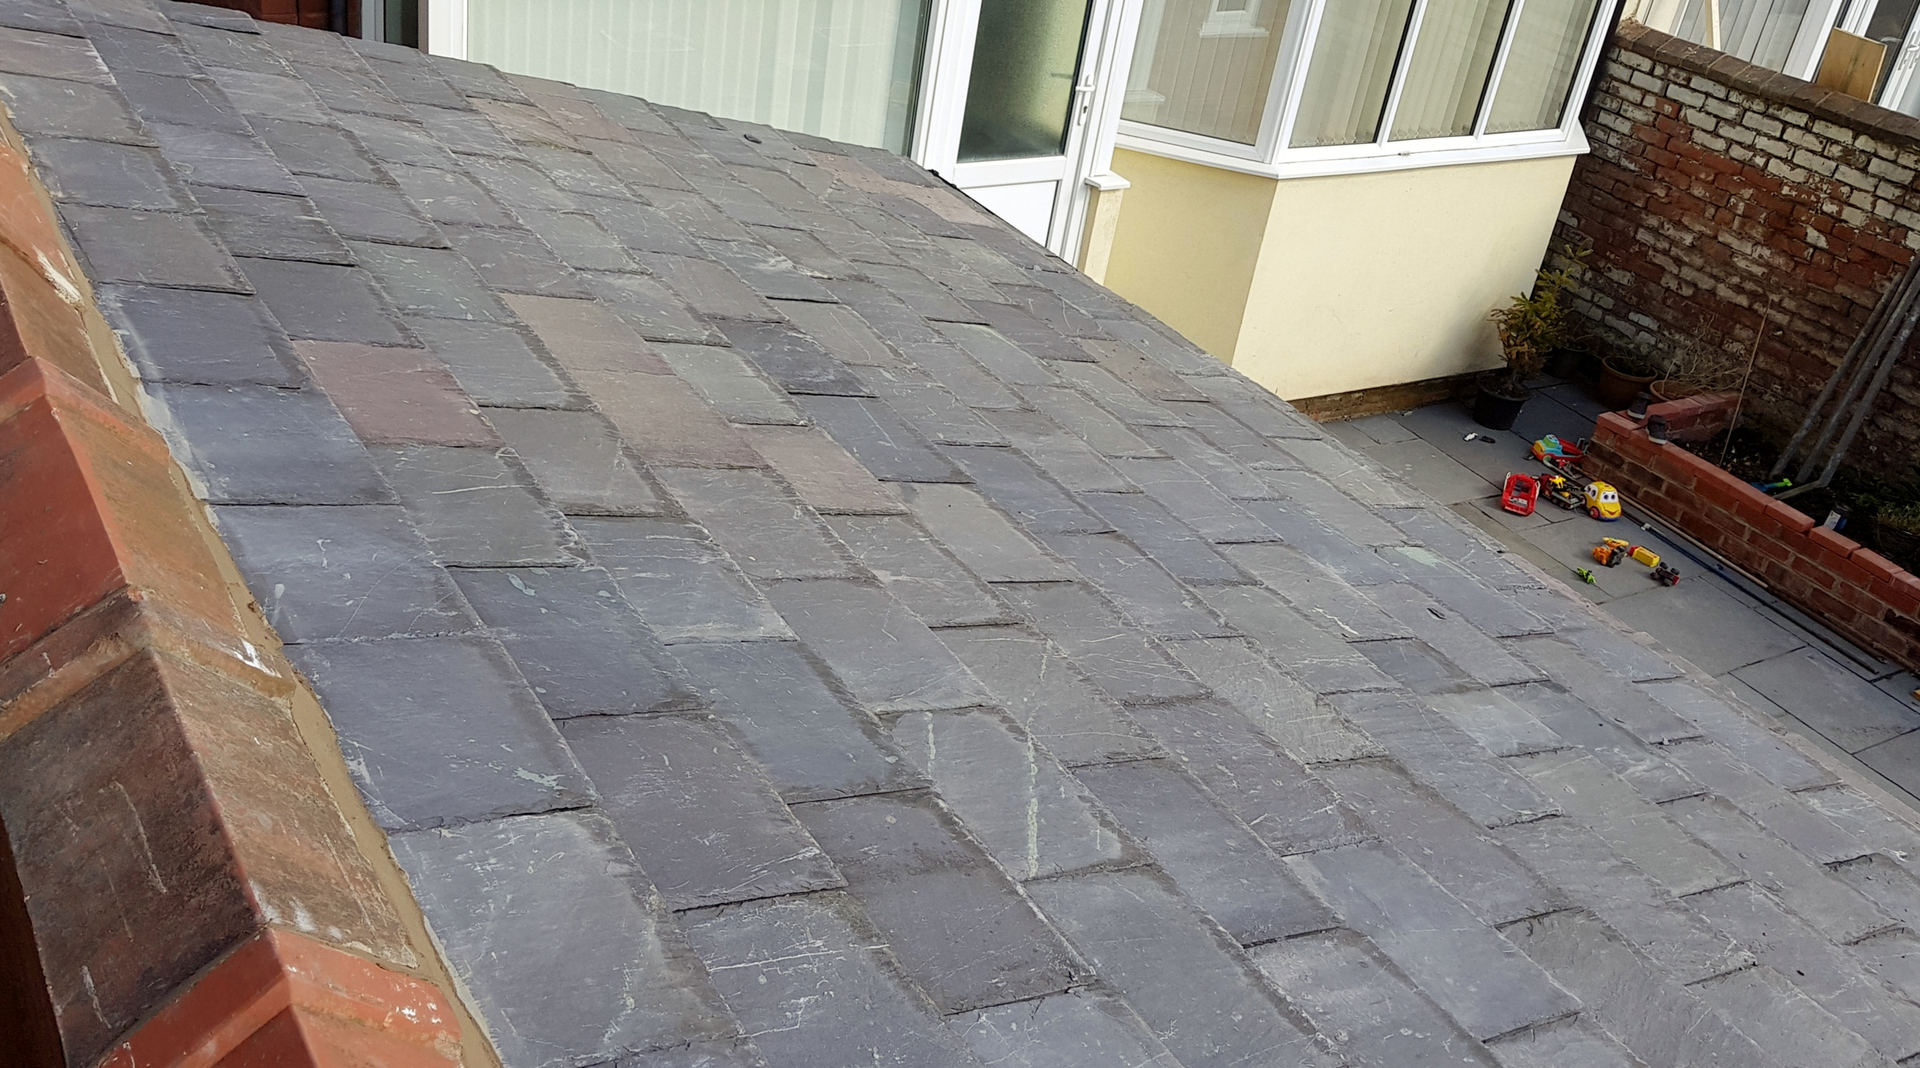 Worst slate roof ever